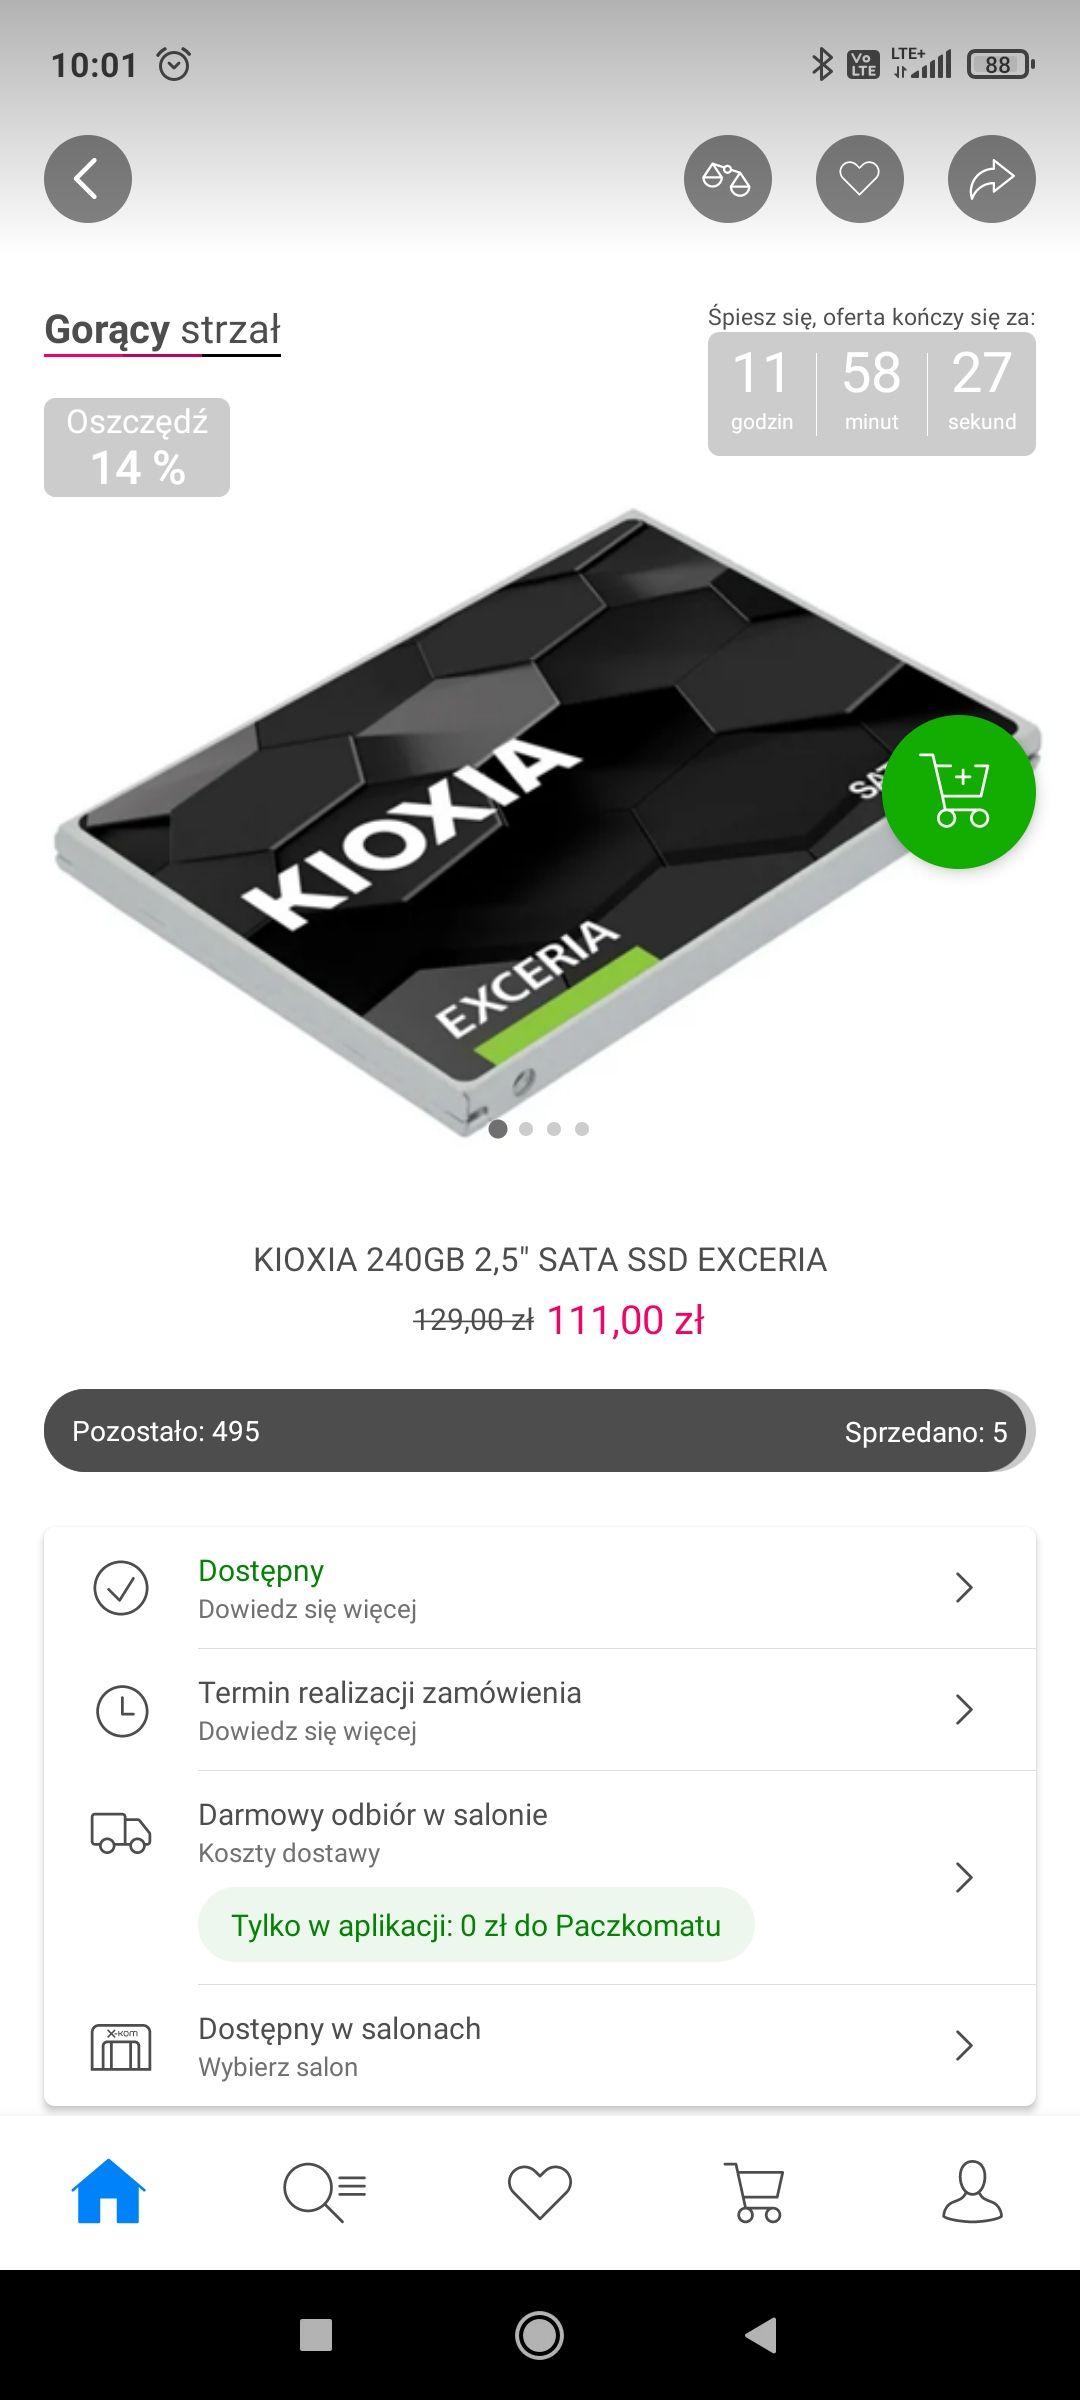 "KIOXIA 240GB 2,5"" SATA SSD EXCERIA"